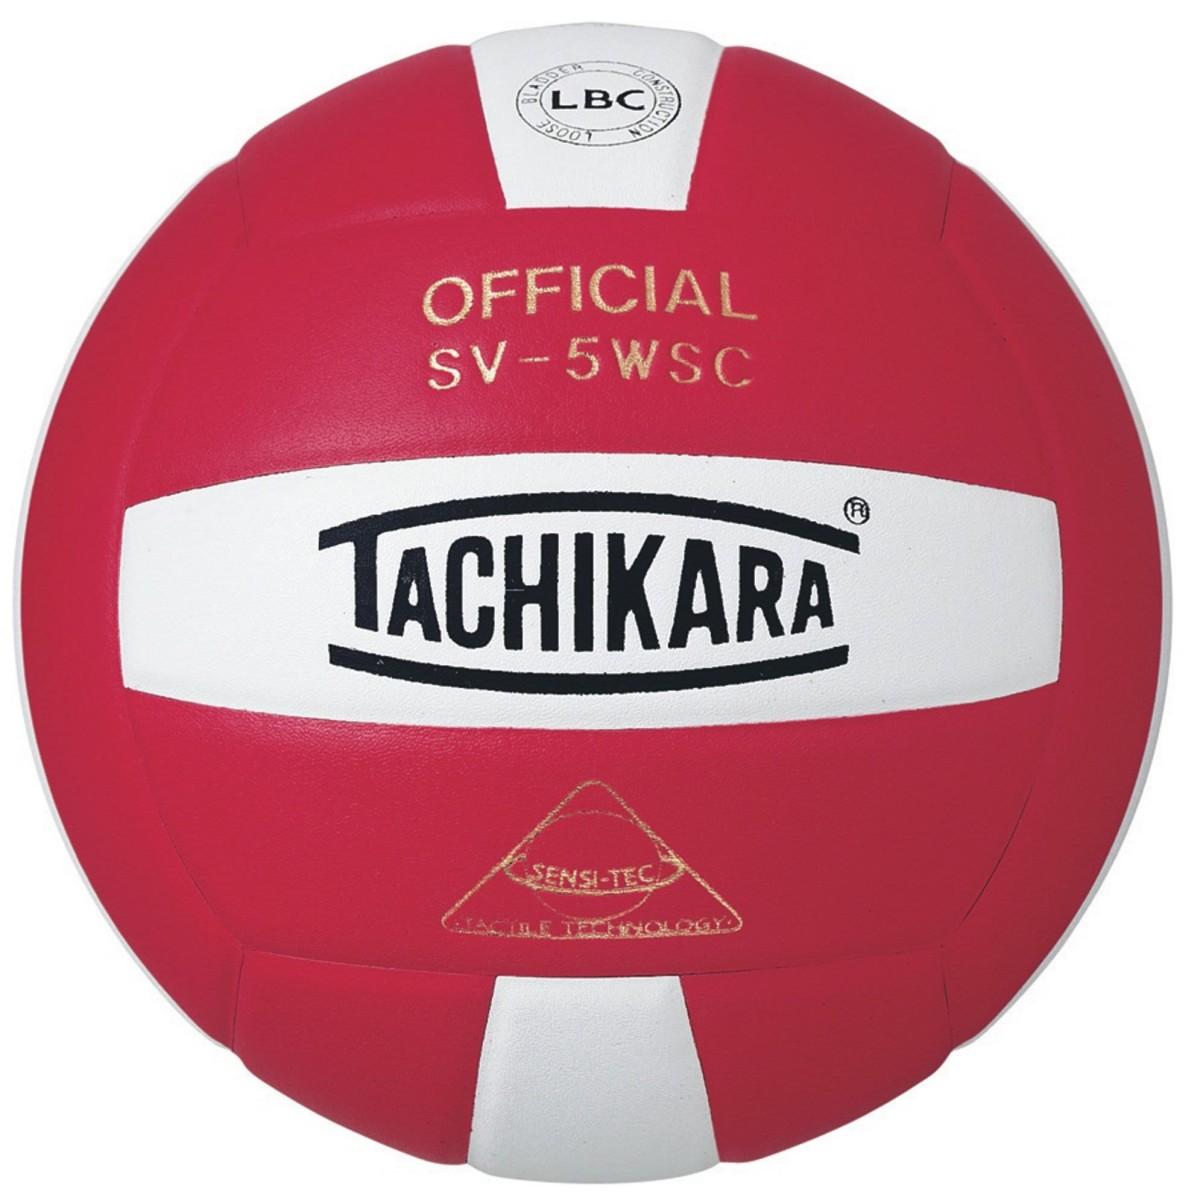 Tachikara® SV-5WSC Colored Volleyballs-BLUE